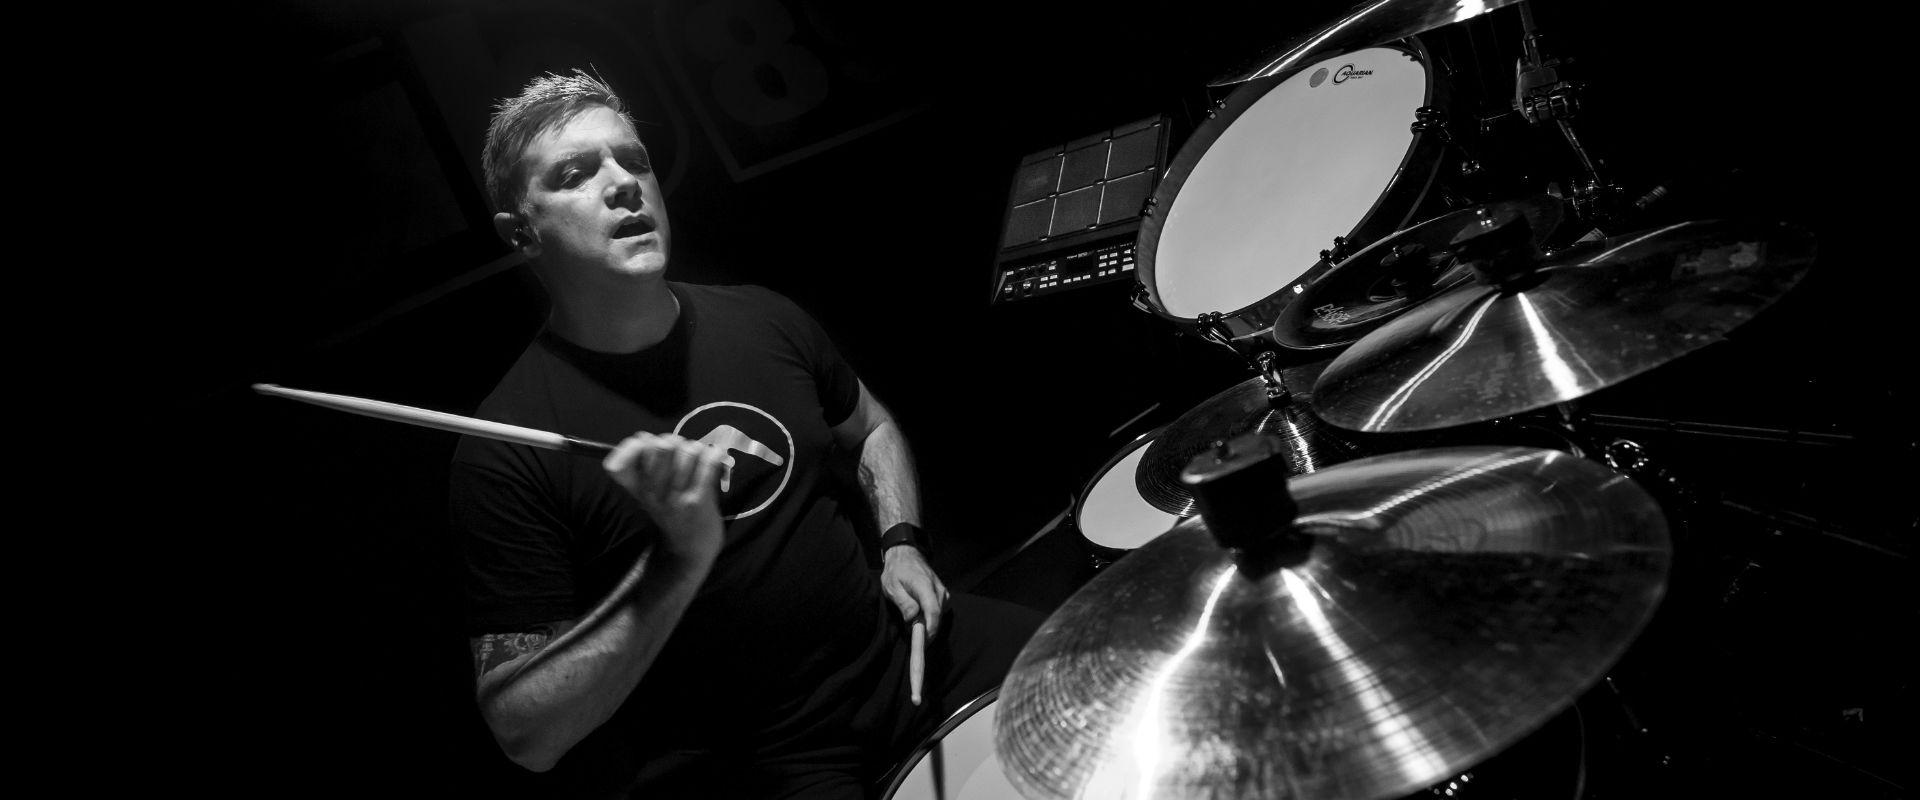 Craig Blundell | The UK Drum Show